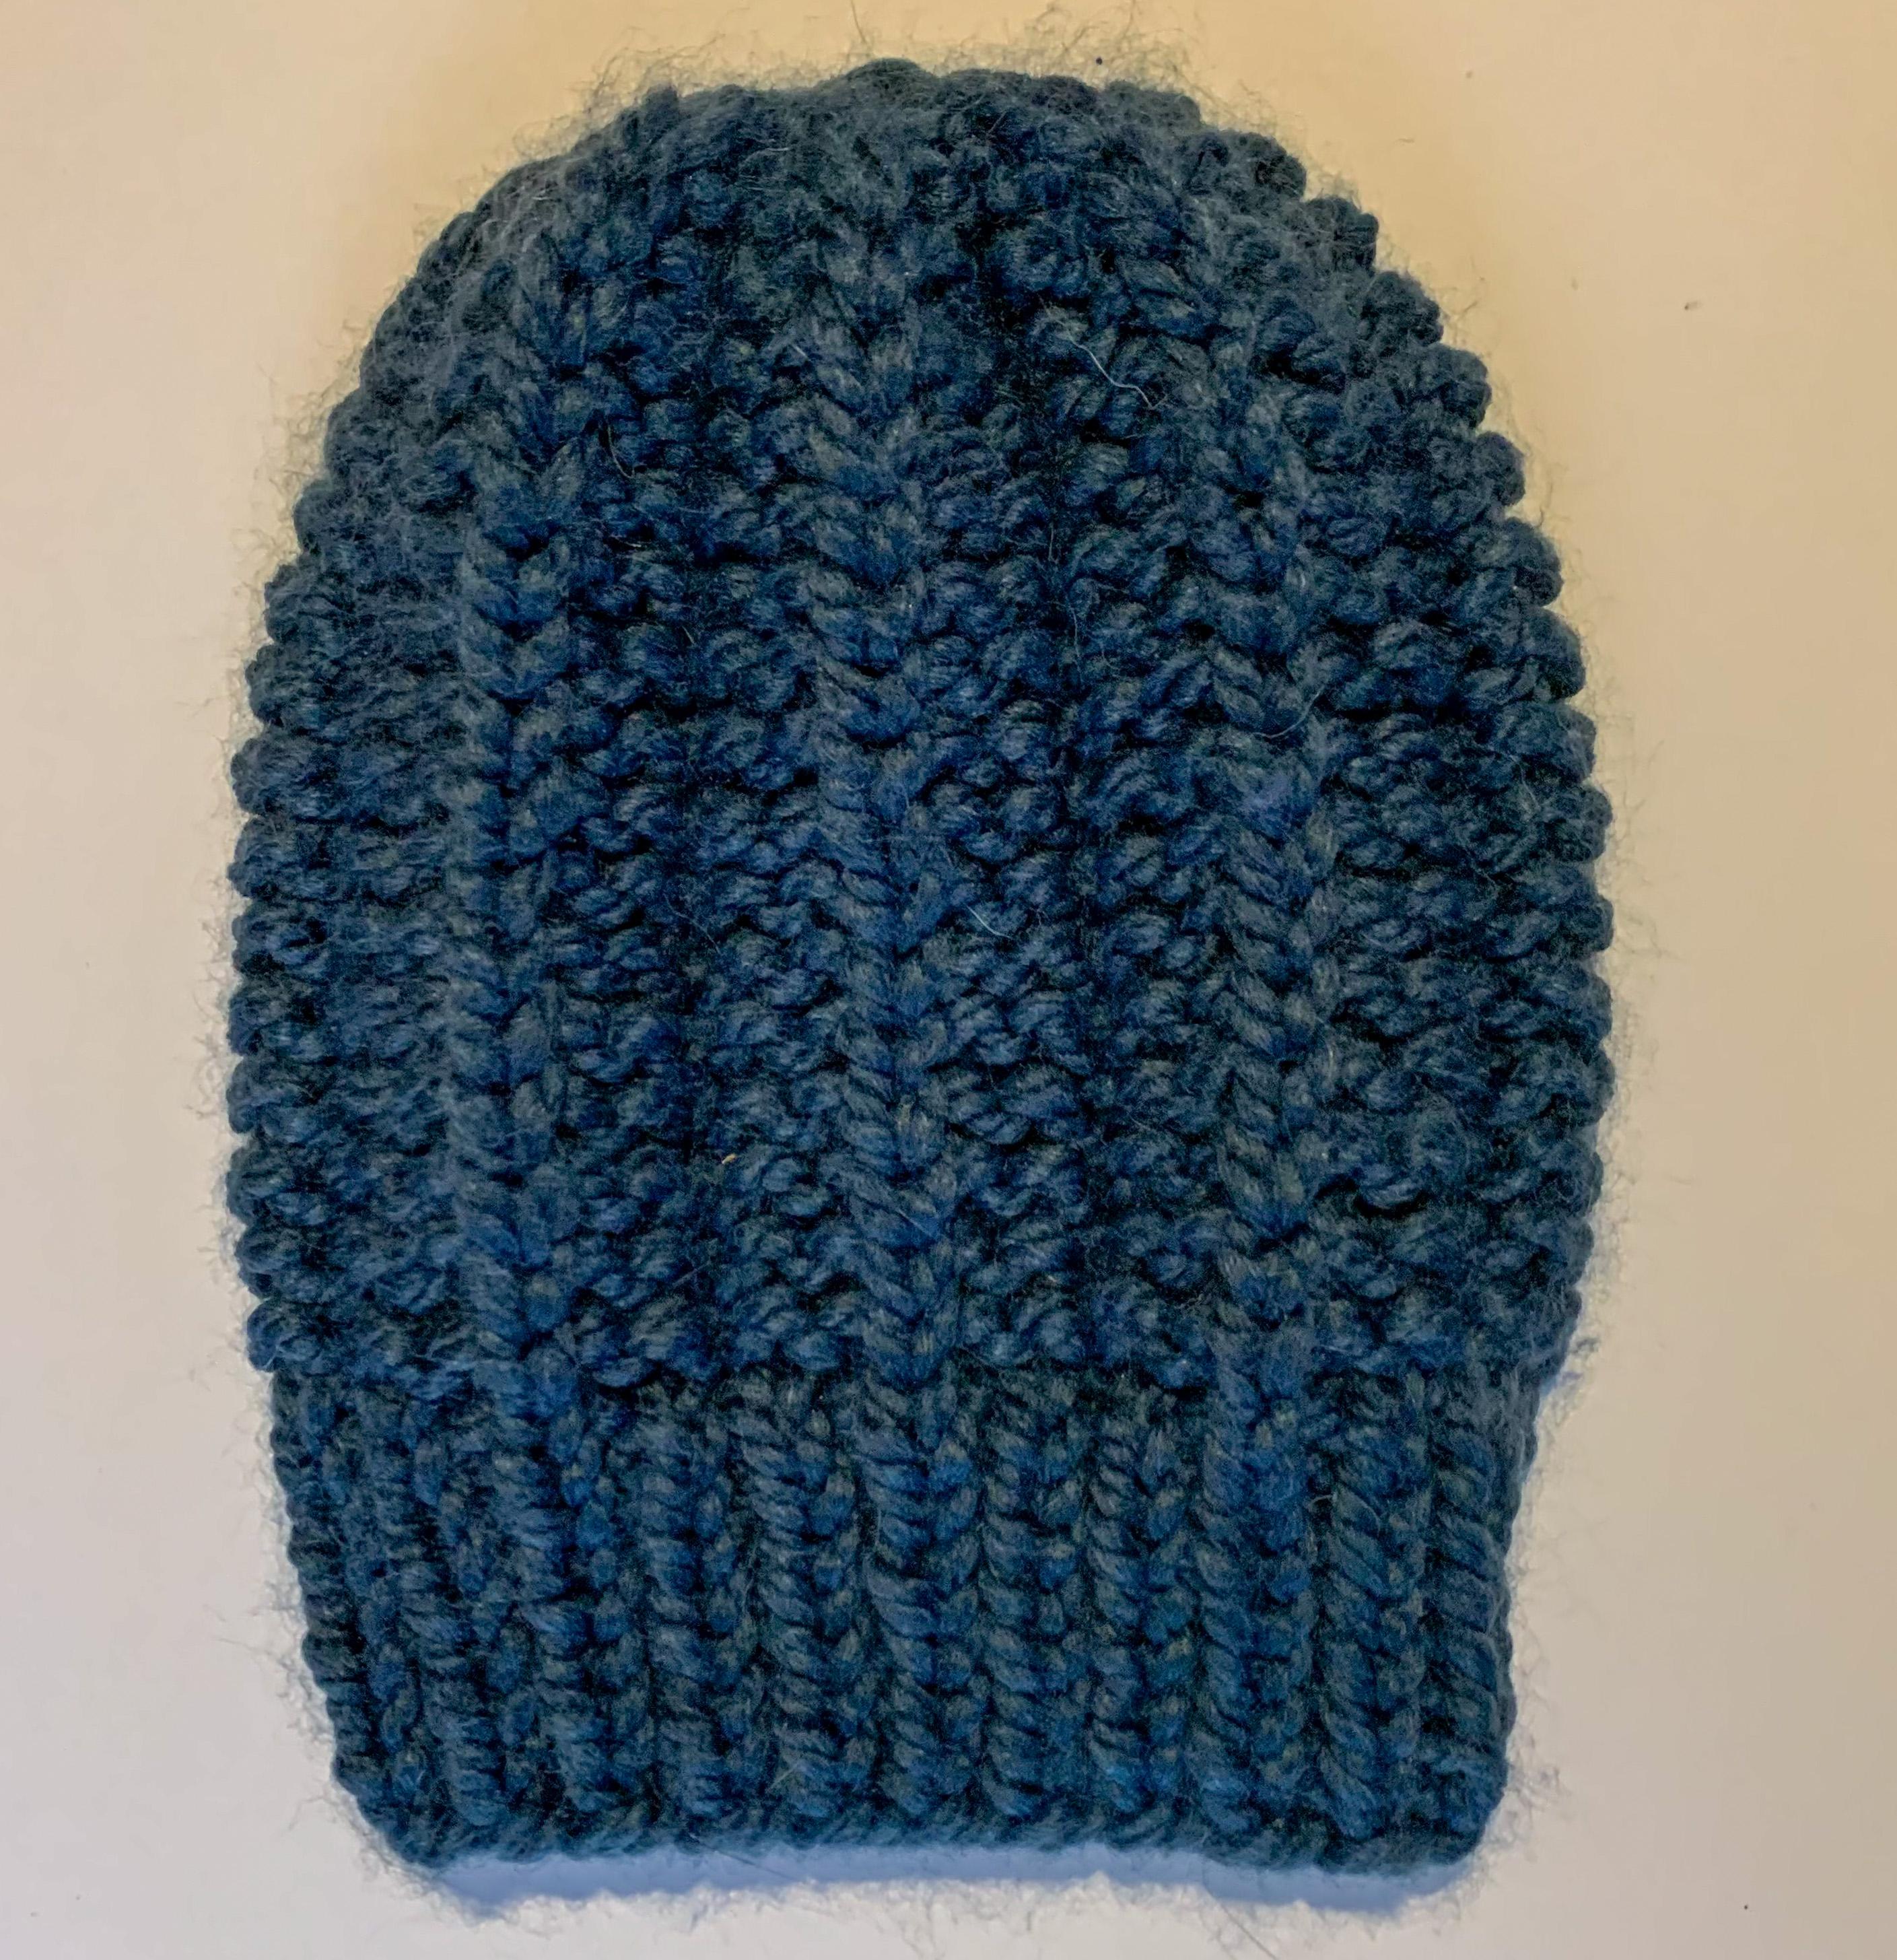 Navy Blue Knit Beanie